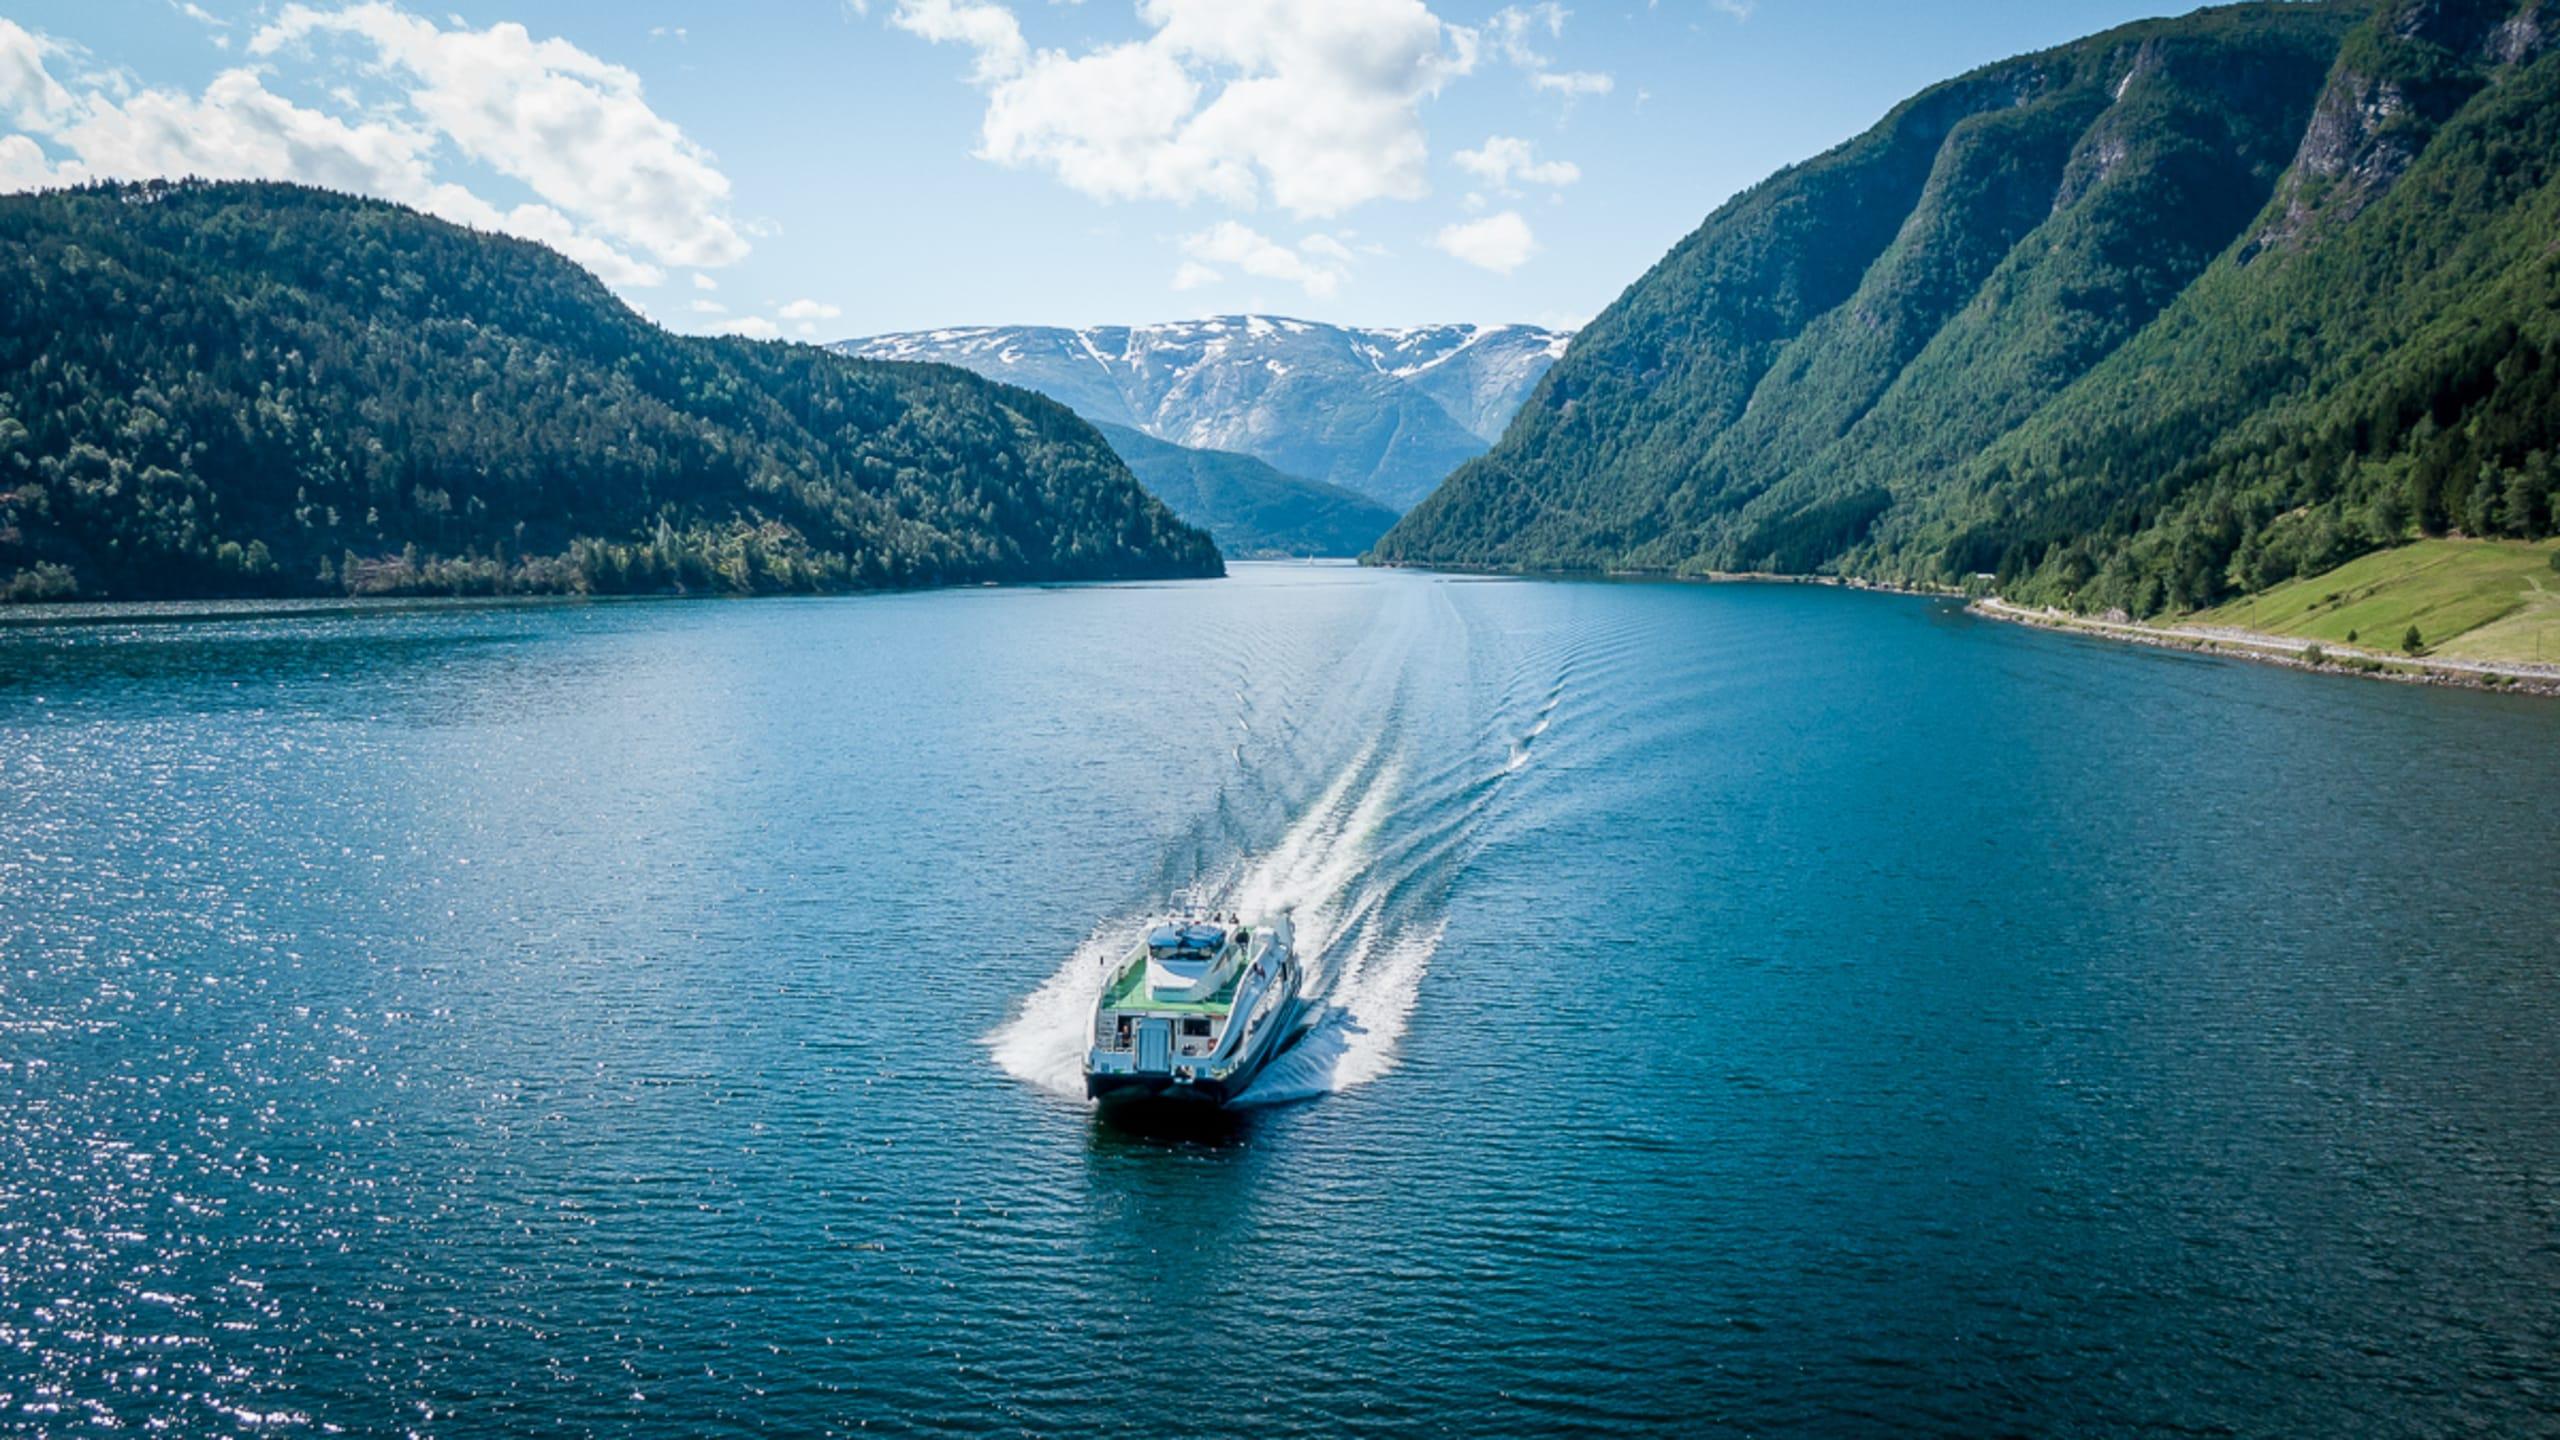 Fjord cruise on the Hardangerfjord